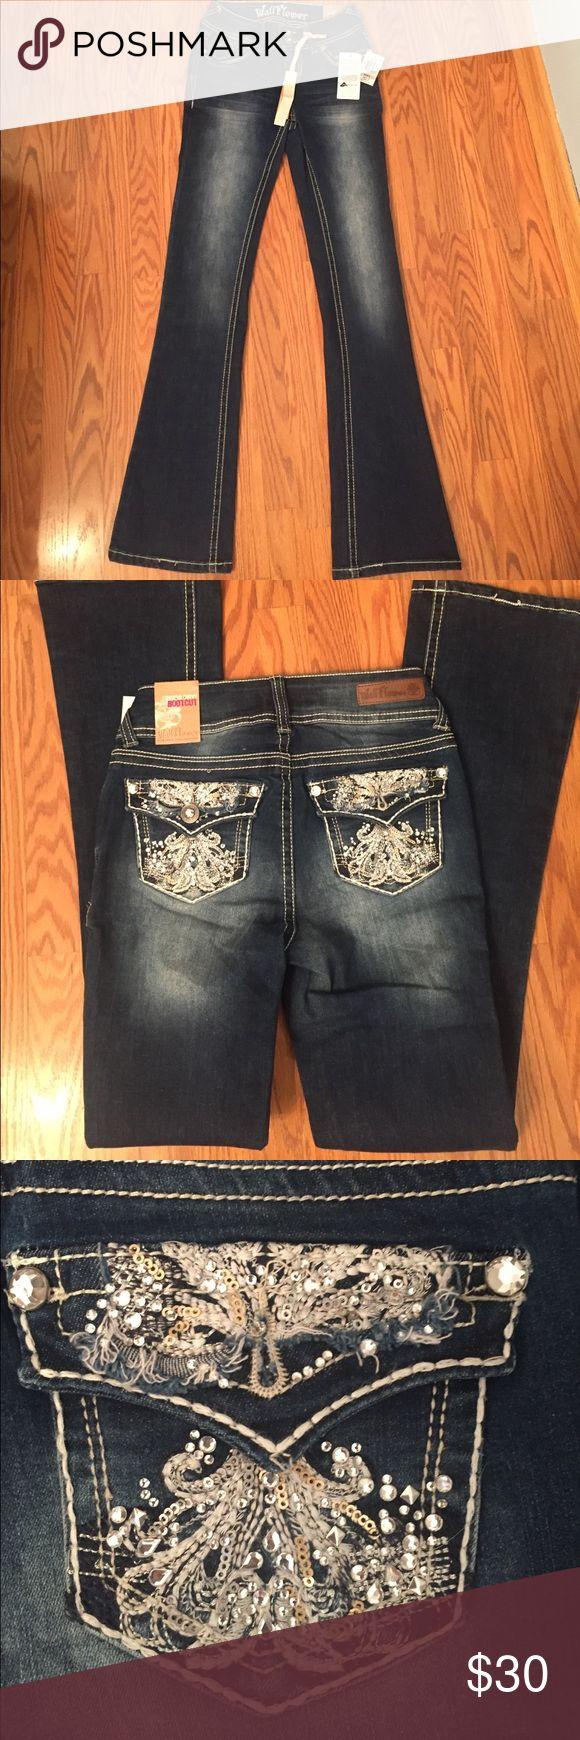 "Wallflower jeans NWT Wallflower luscious curvy bootcut jeans, inseam 31"" mid rise Wallflower Jeans Boot Cut"